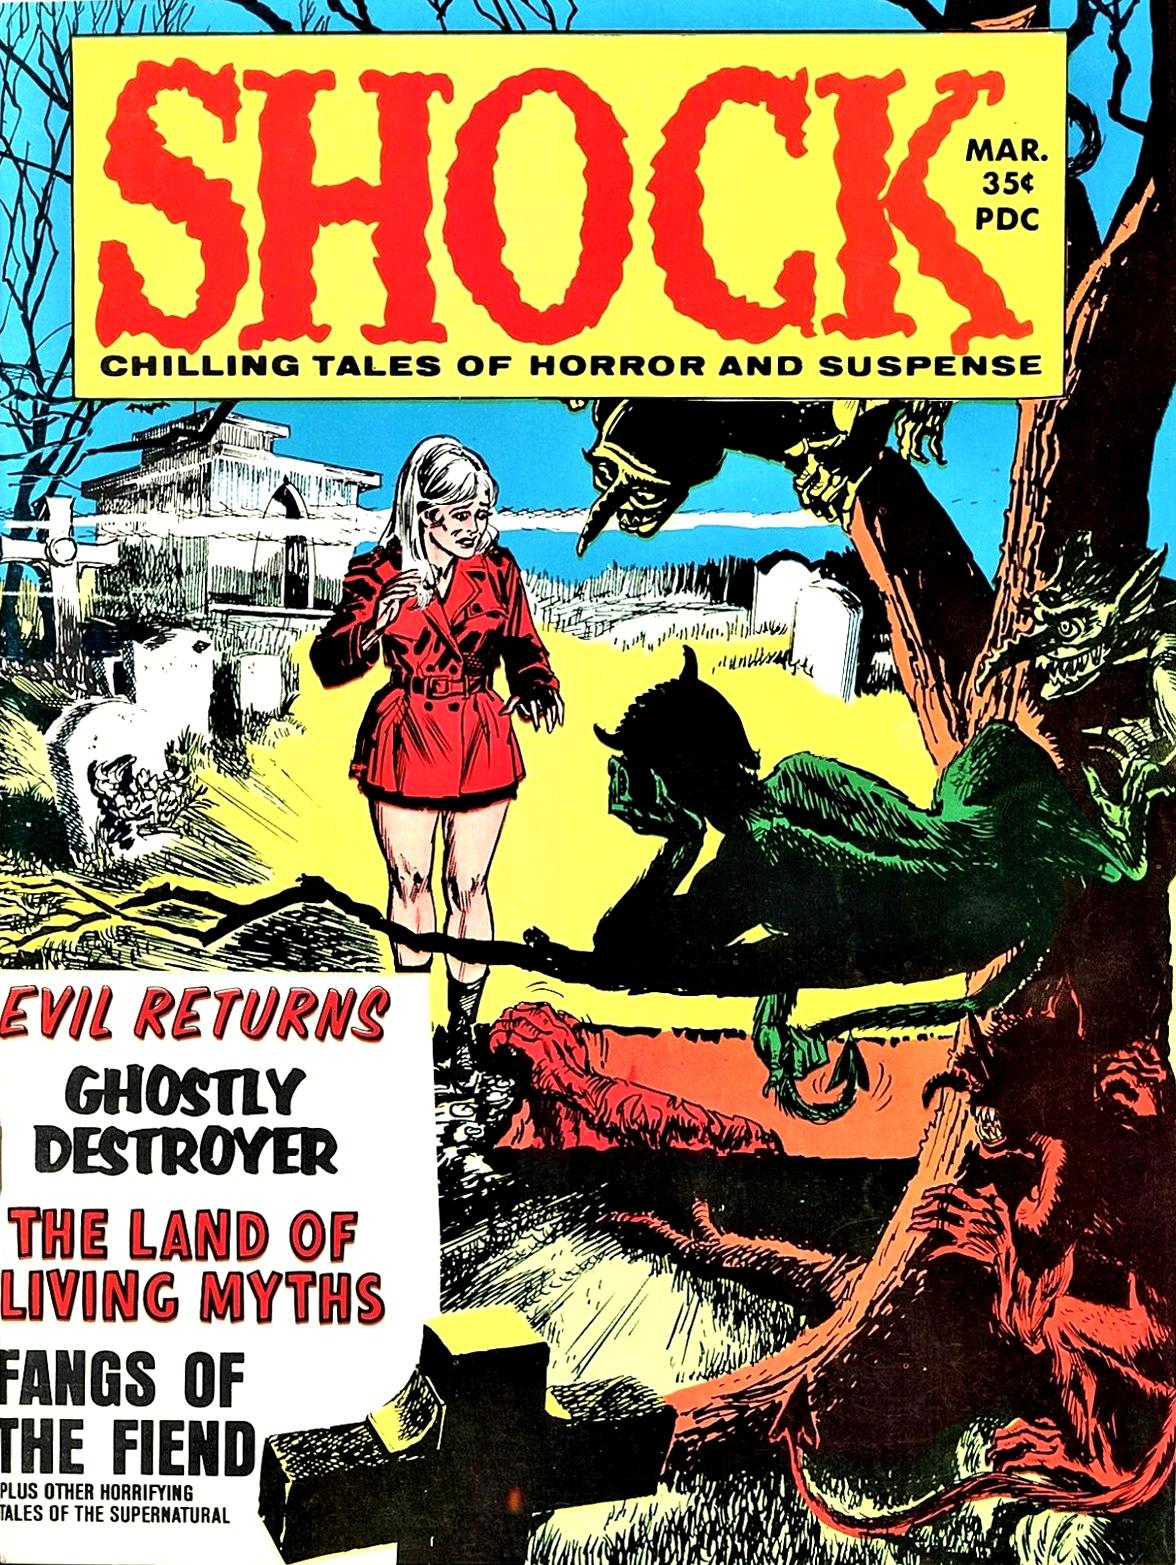 Shock - Volume 1, Issue 07, March 1970